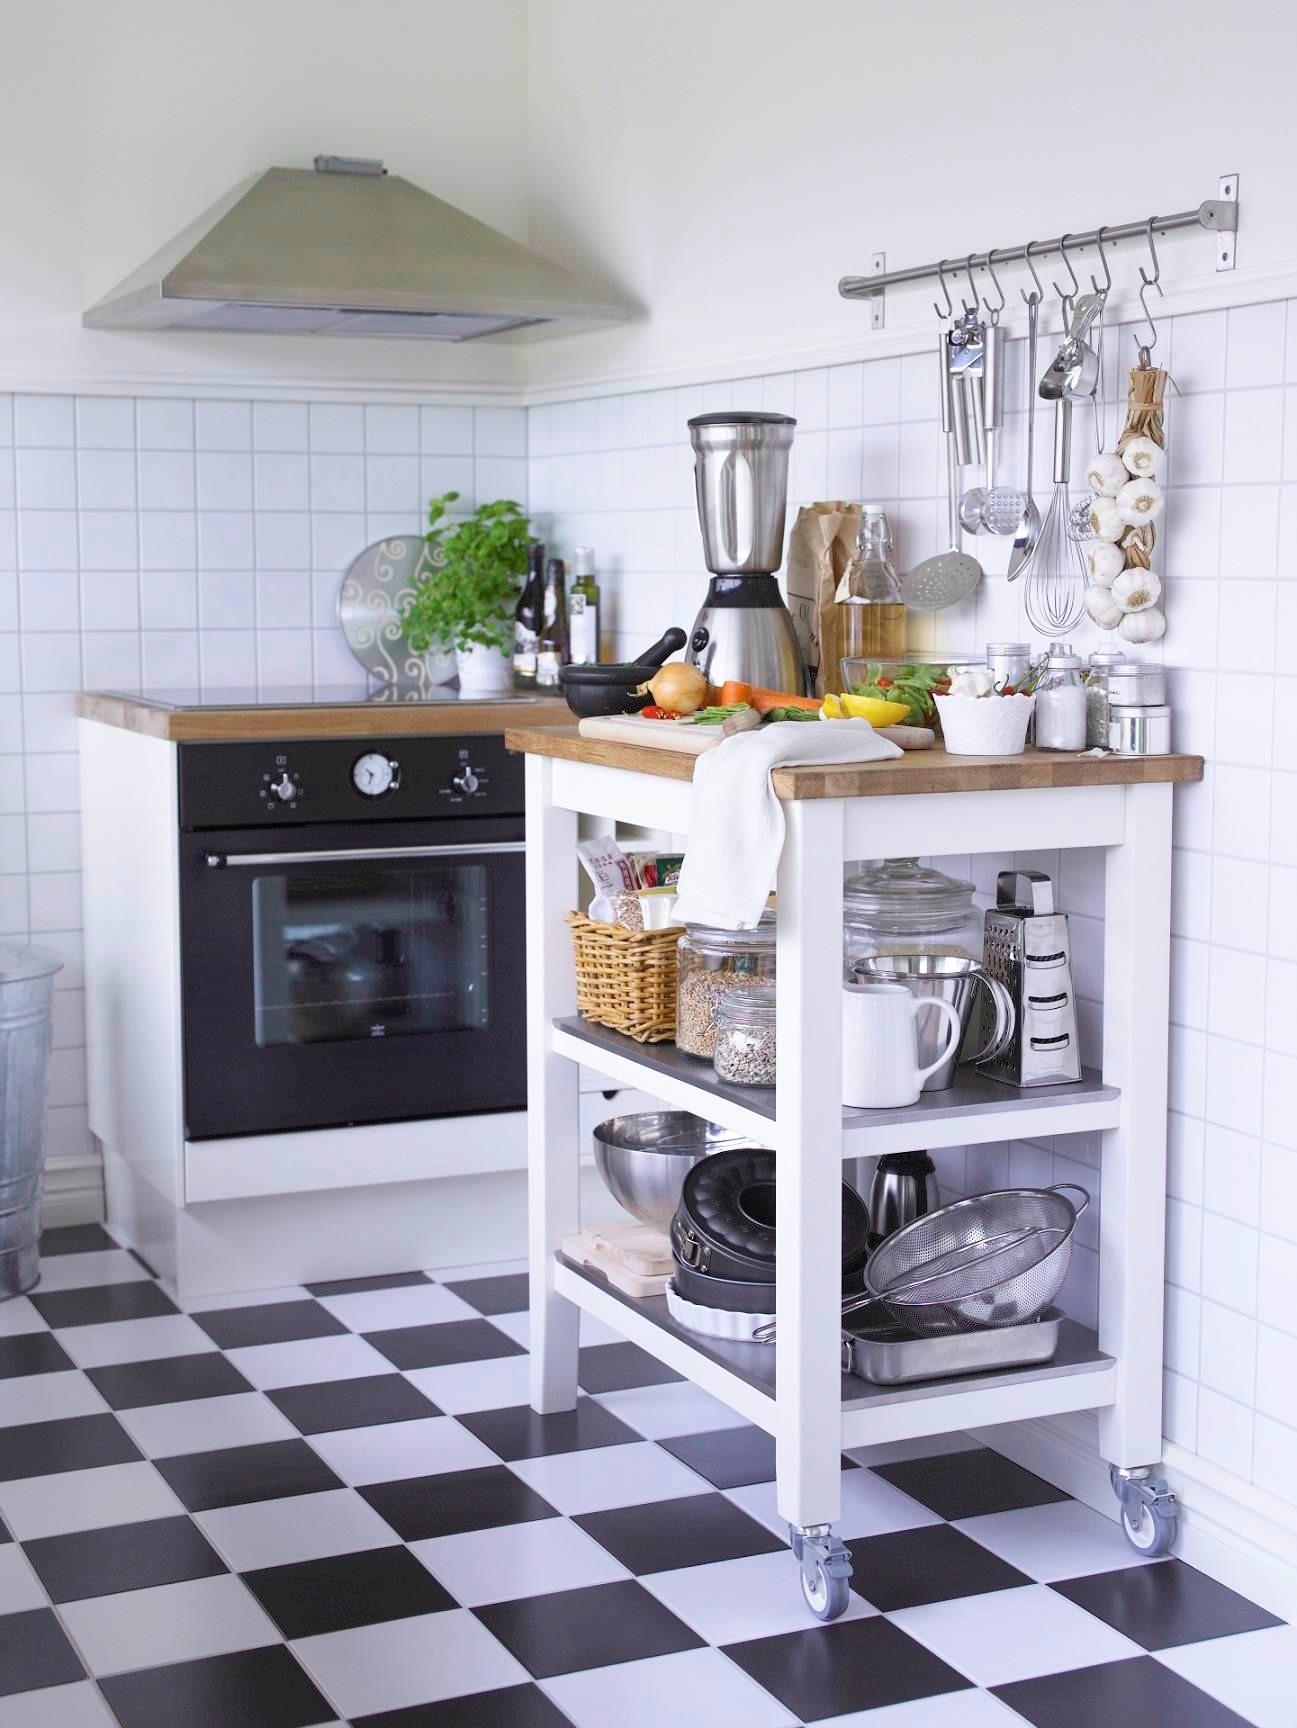 STENSTORP白色橡木廚房推車可提供額外儲物空間及工作檯面,附2片固定式不鏽鋼層板,衛生堅固又耐用(原價$7,990/特價$5,992)圖片提供_IKEA